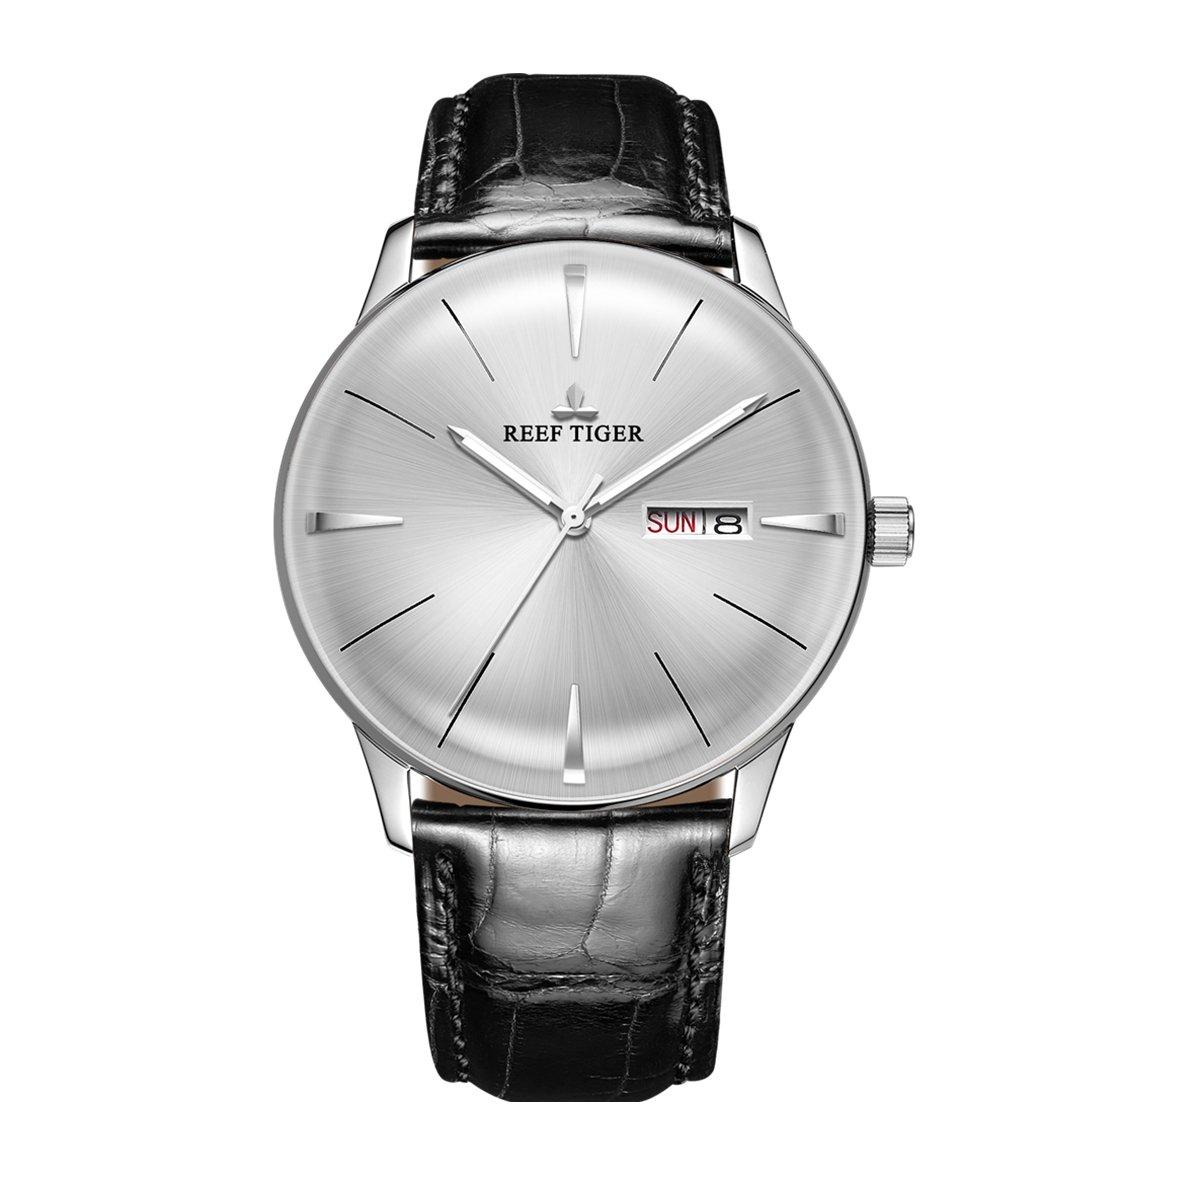 Reef Tiger Classic Dress Watches Mens Convex Lens Glass Mechanical Watches Calfskin Strap RGA8238 (RGA8238-YWB)